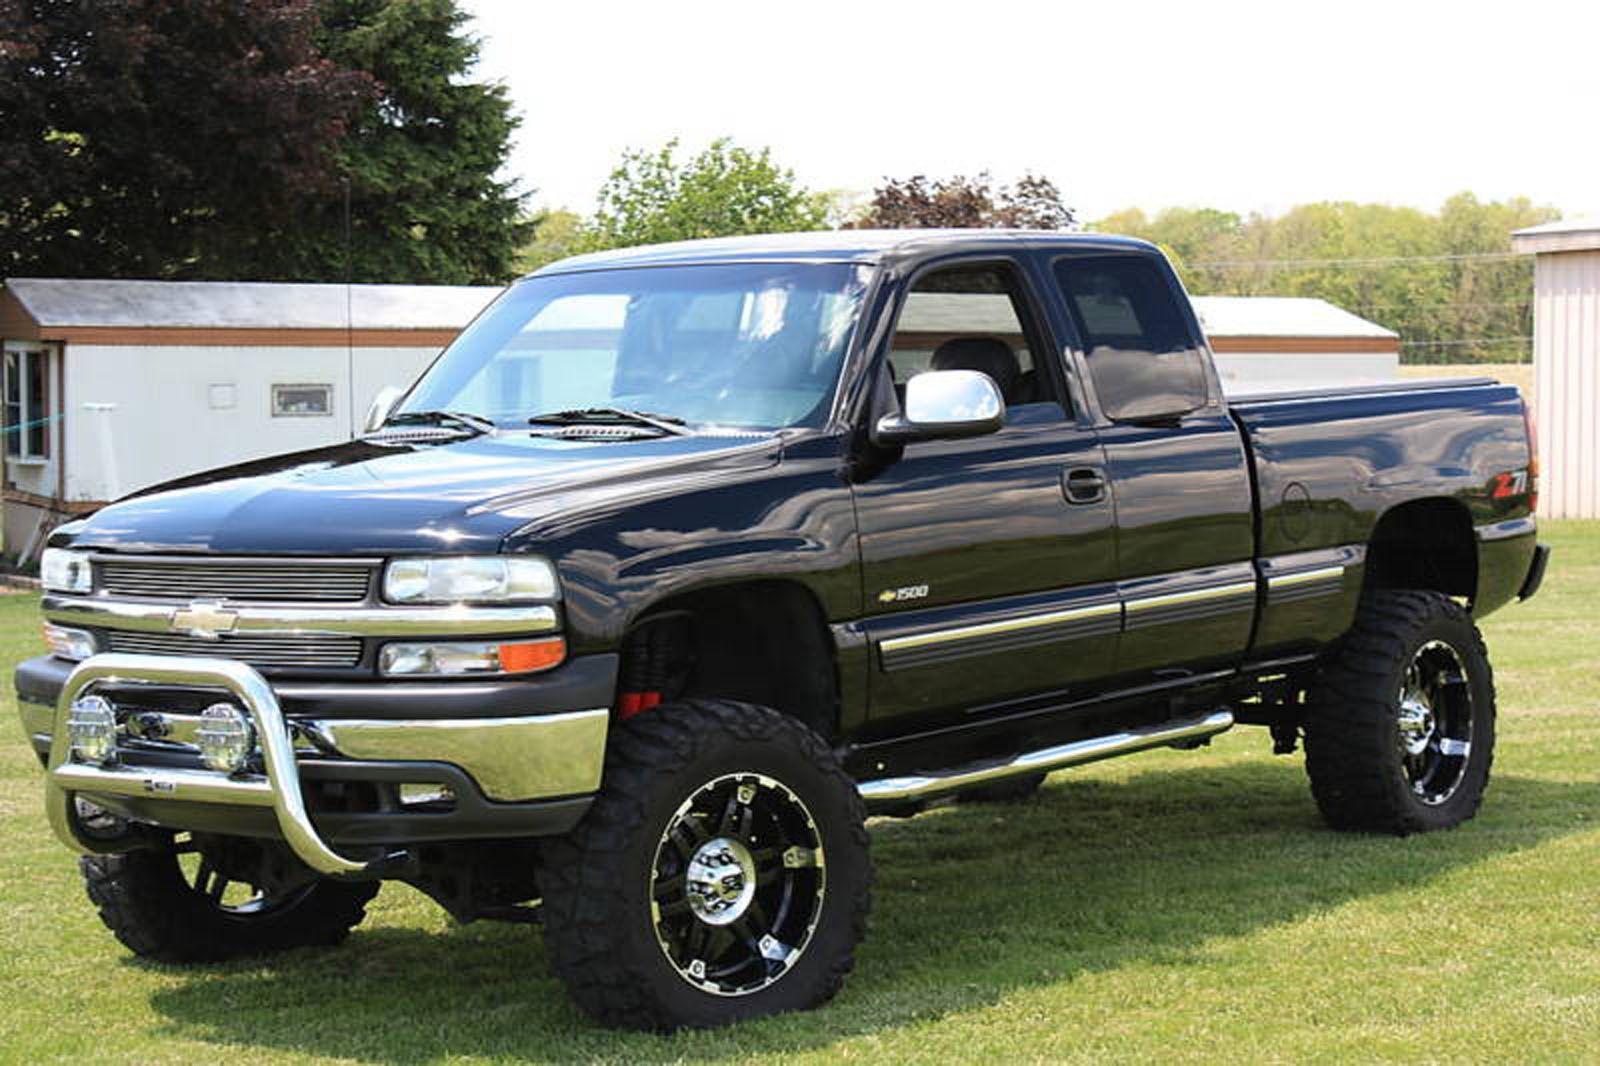 custom 4x4 chevy trucks 2000 chevrolet silverado 4x4 lt z71 lifted trucks pinterest. Black Bedroom Furniture Sets. Home Design Ideas